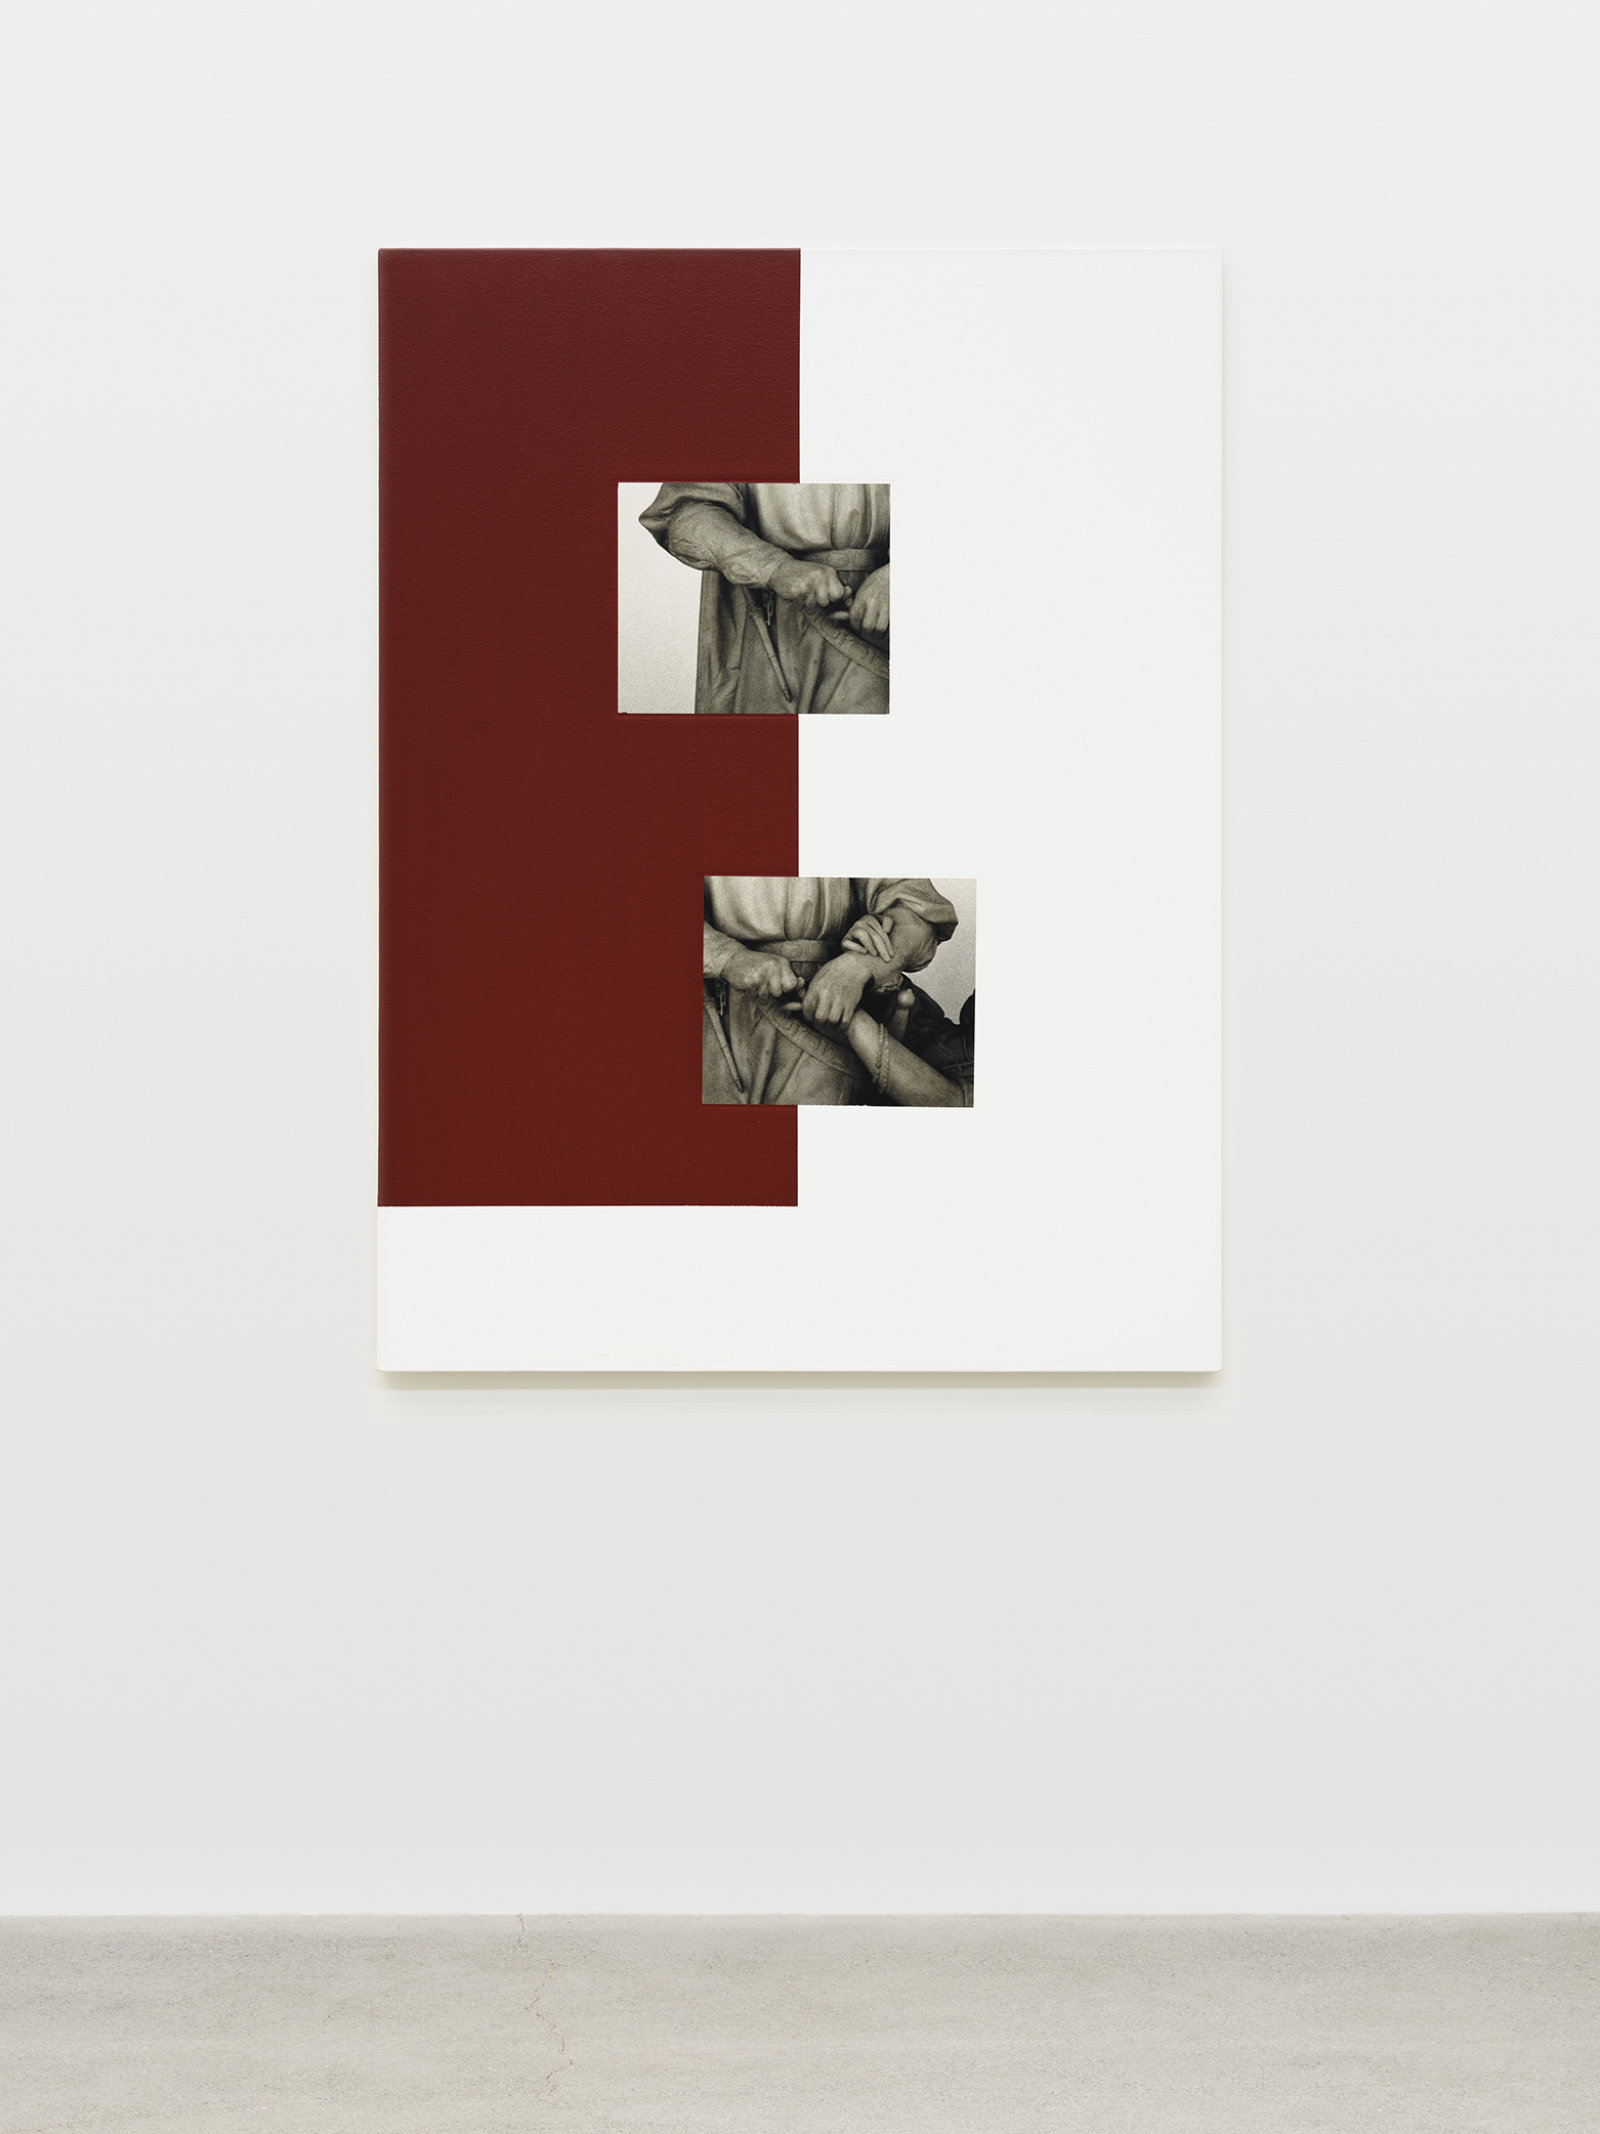 Ian Wallace, Historia, 2008, photolaminate with acrylic on canvas, 48 x 36 in. (122 x 91 cm)